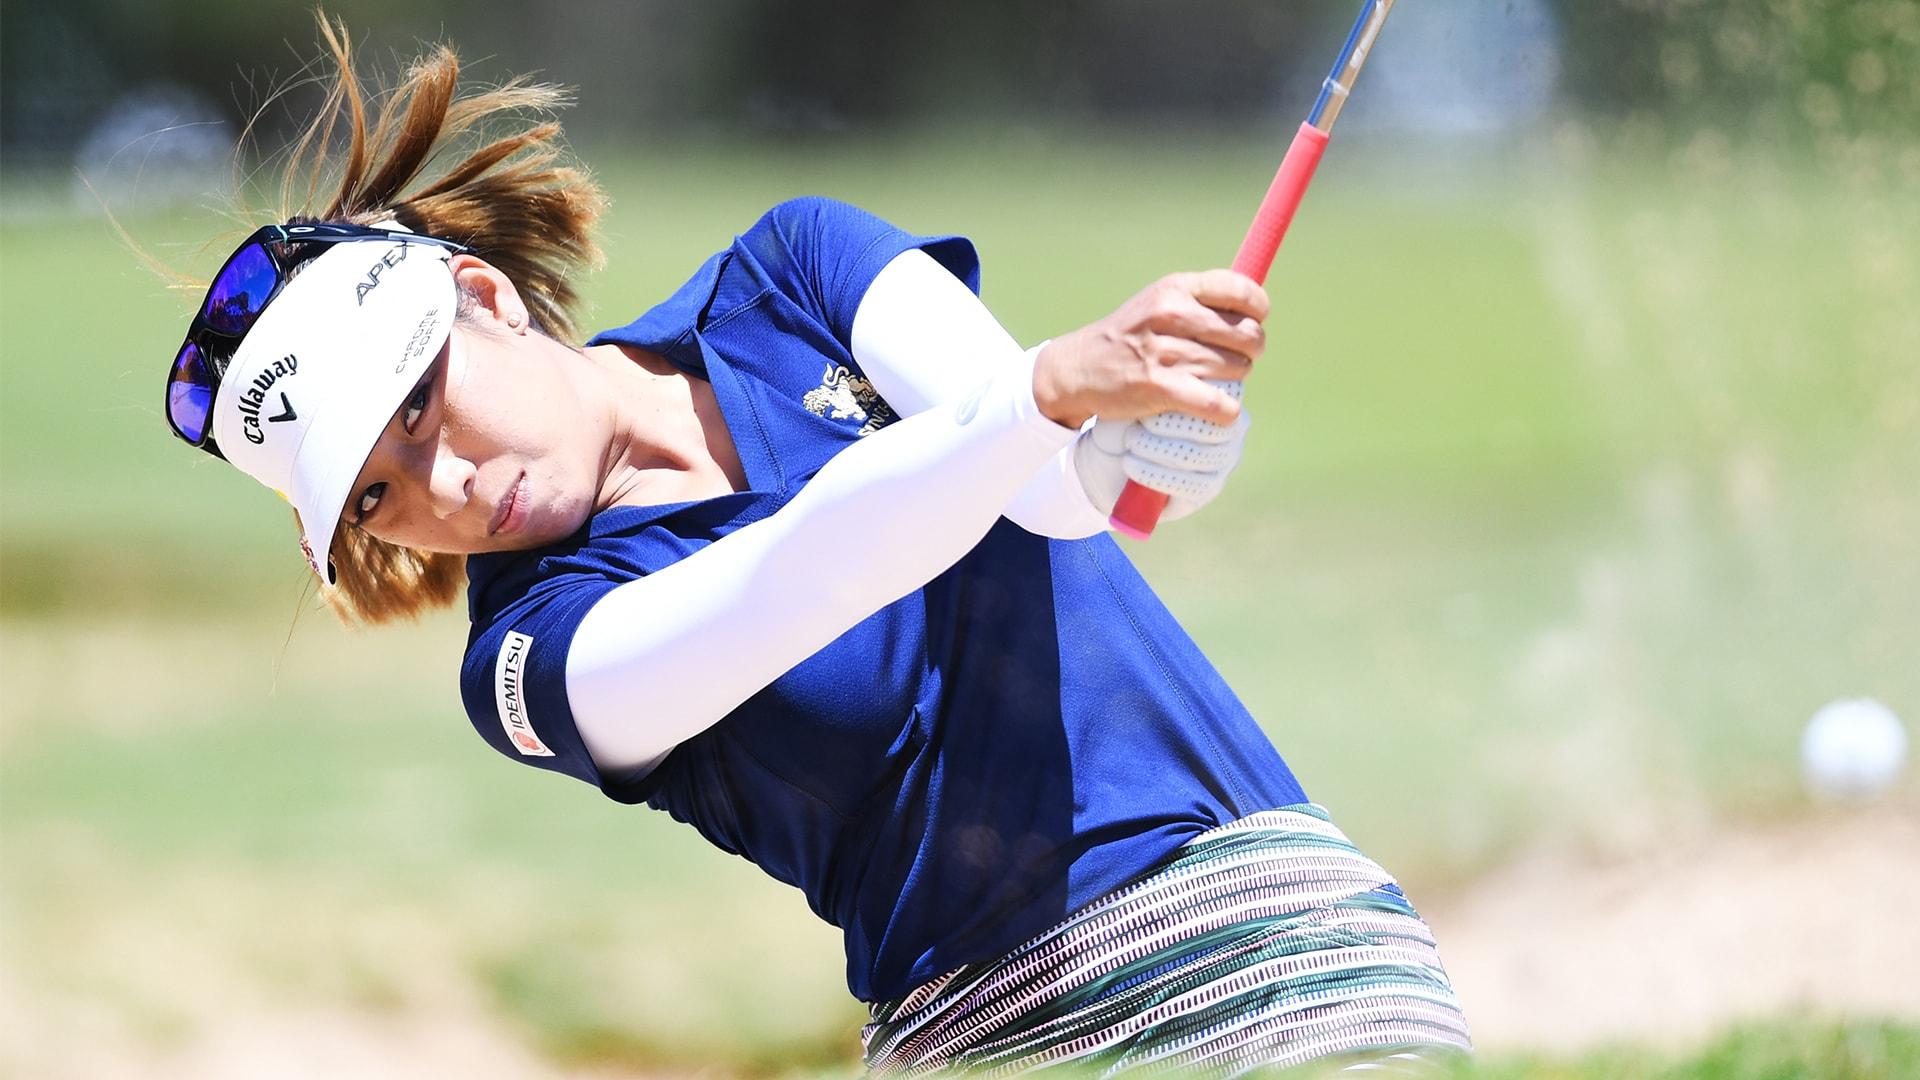 Prima Thammaraks vaults into lead at LPGA Q-School with third consecutive  68 | Golf Channel